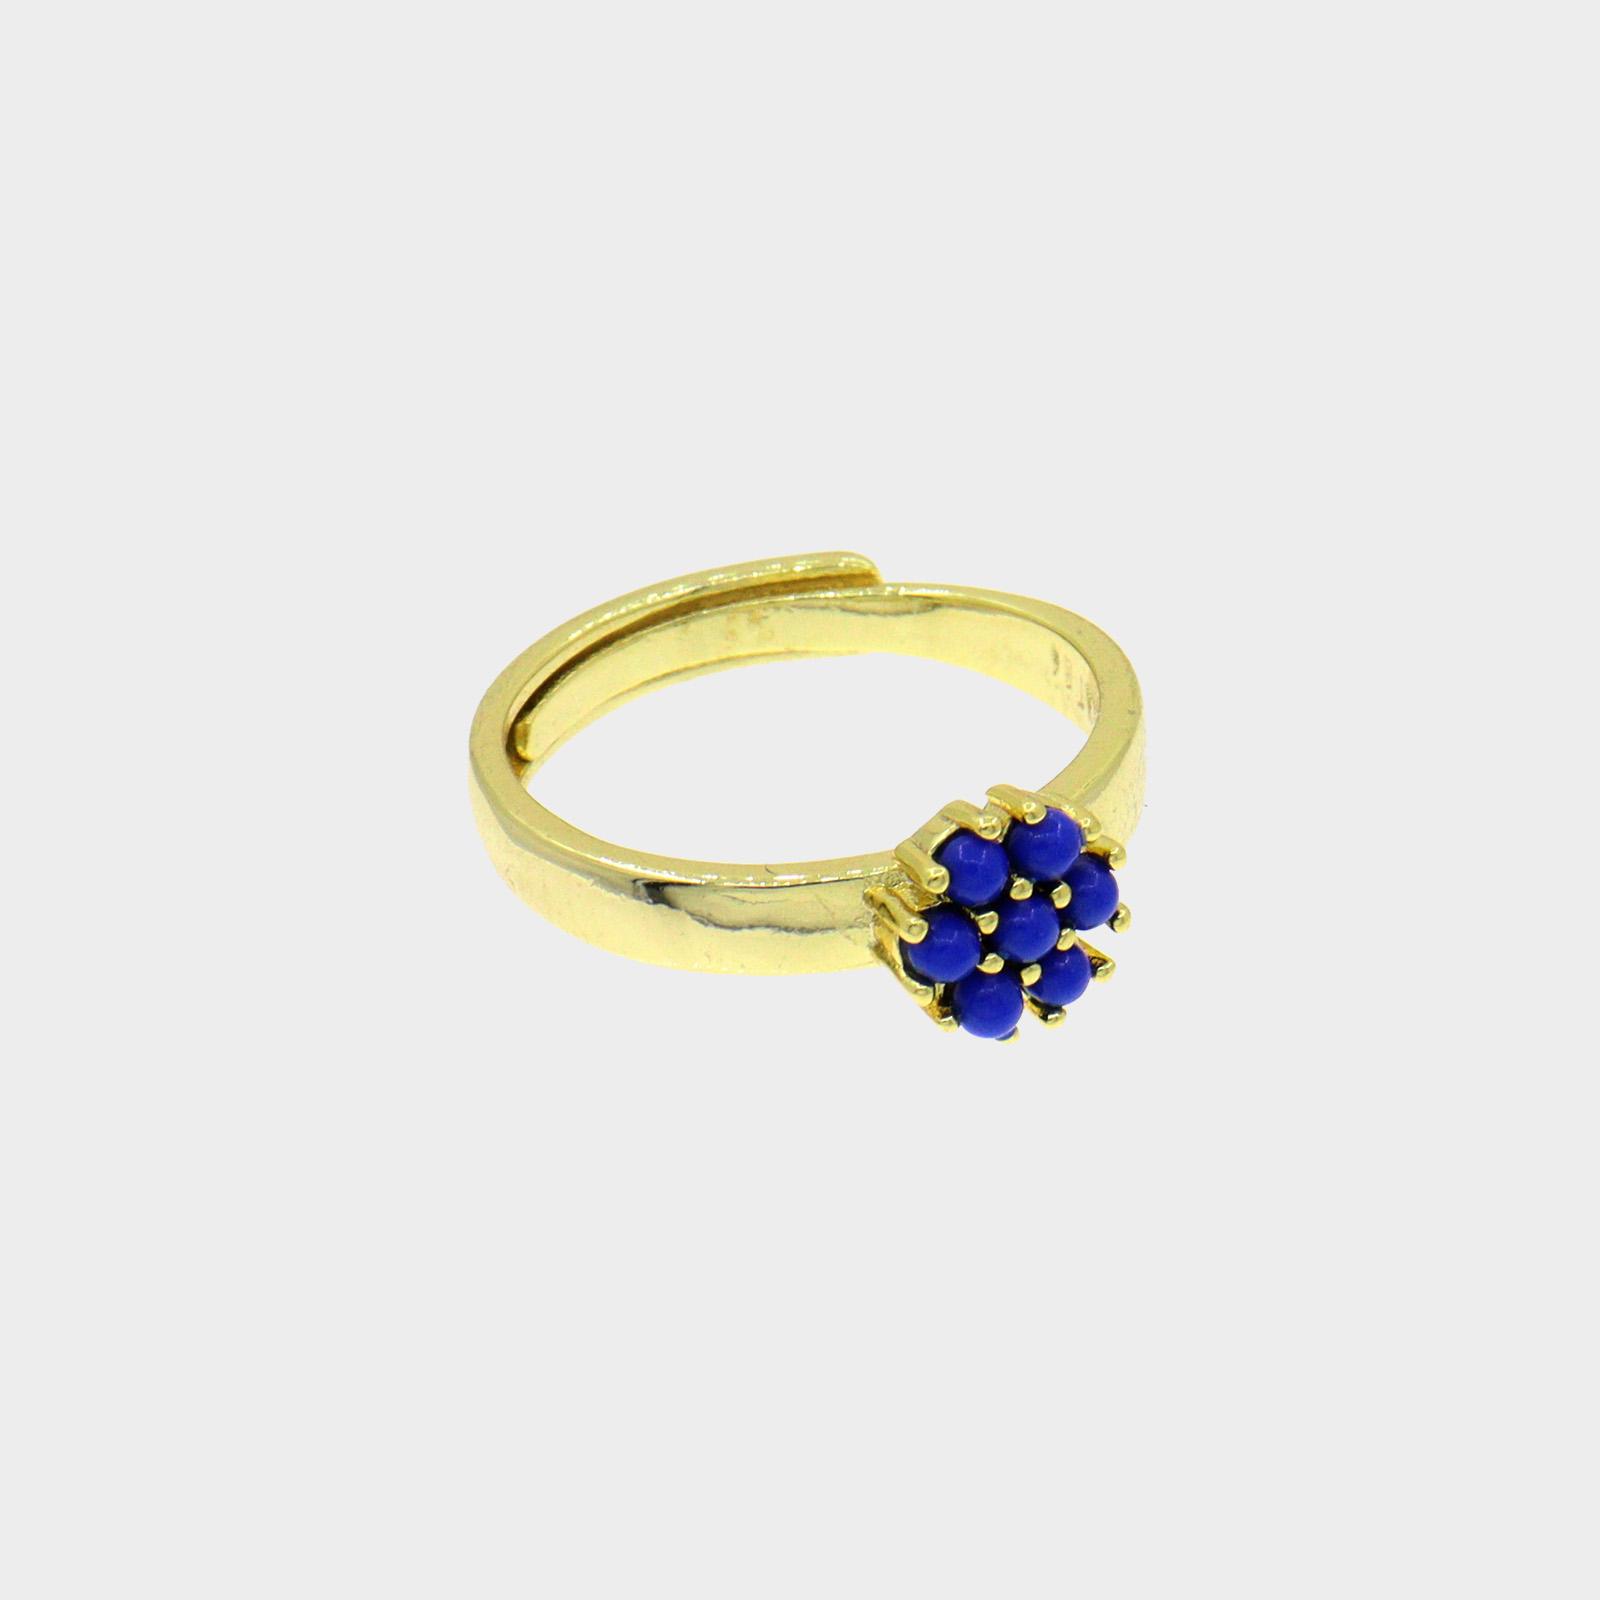 The Amazon single Ring Blue